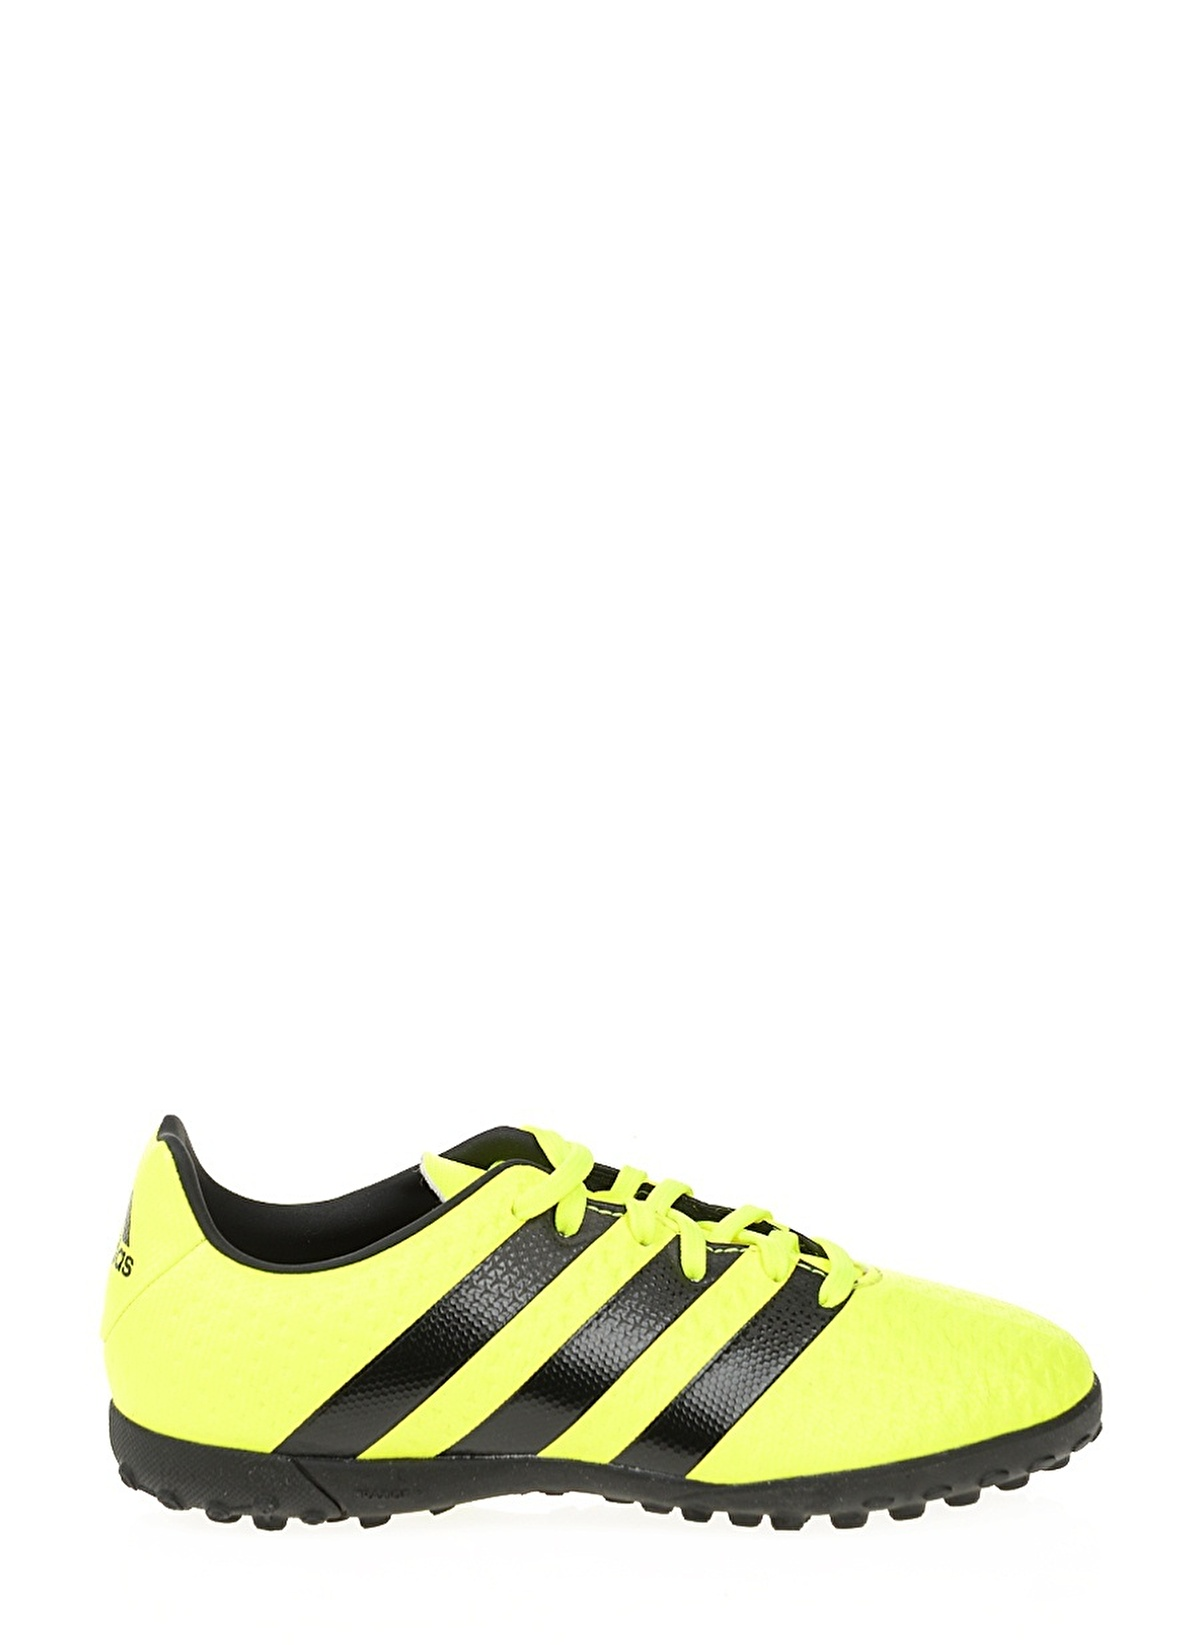 uk availability 6b73f 47b05 ... adidas Ace 16.4 Tf J Siyah ...